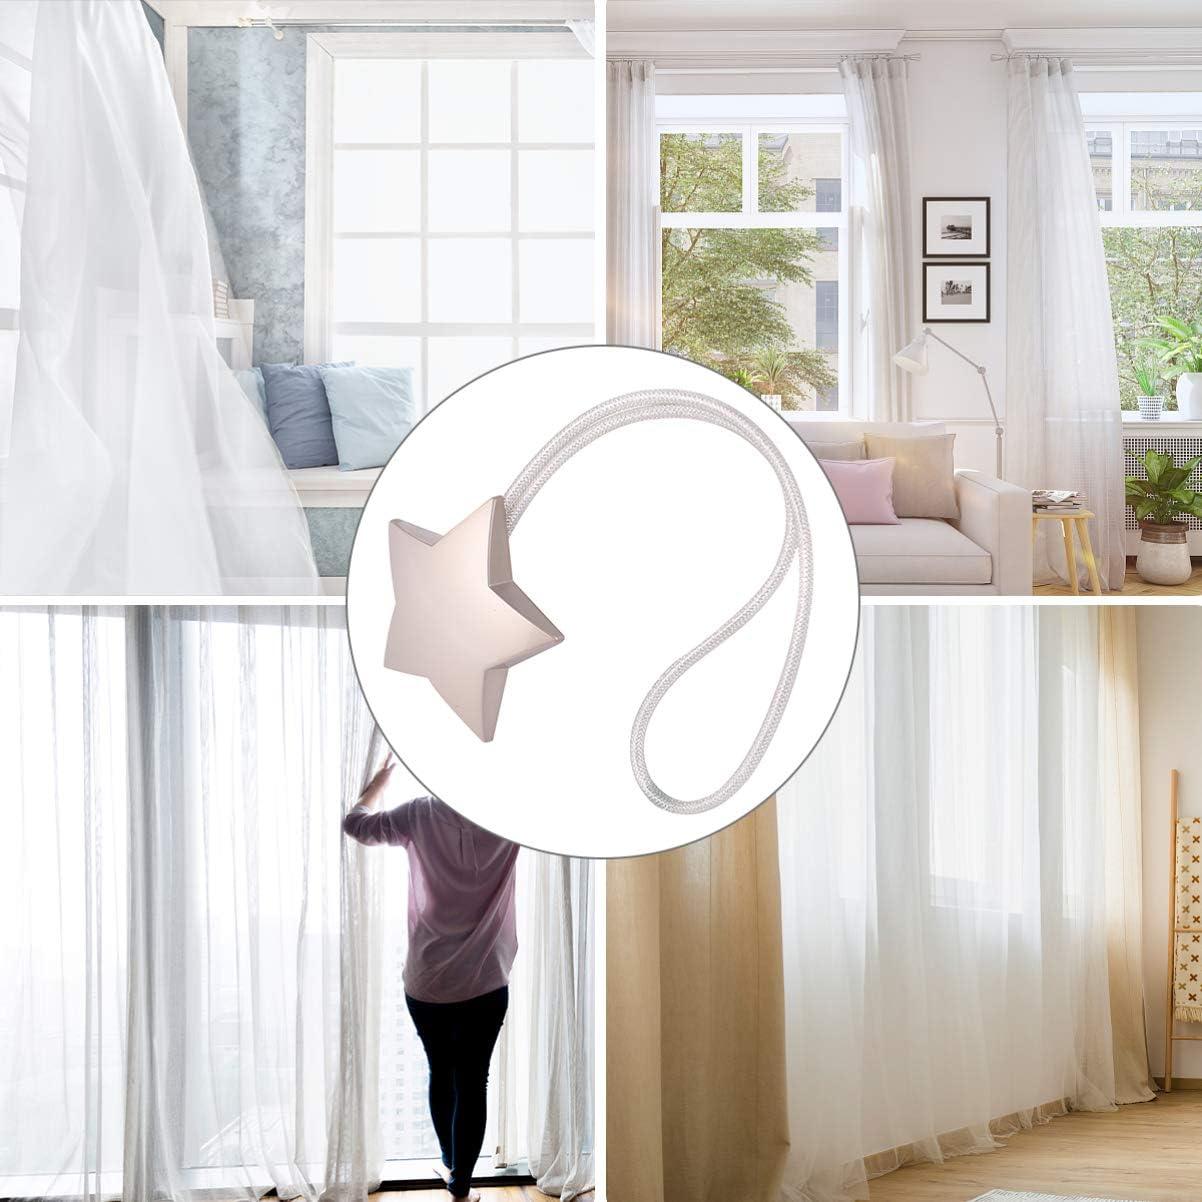 VOSAREA Star Magnetic Curtain Holdback Window Curtain Tiebacks Clips Decorative Curtain Buckle Drapery Holder for Home Balcony Decor Green